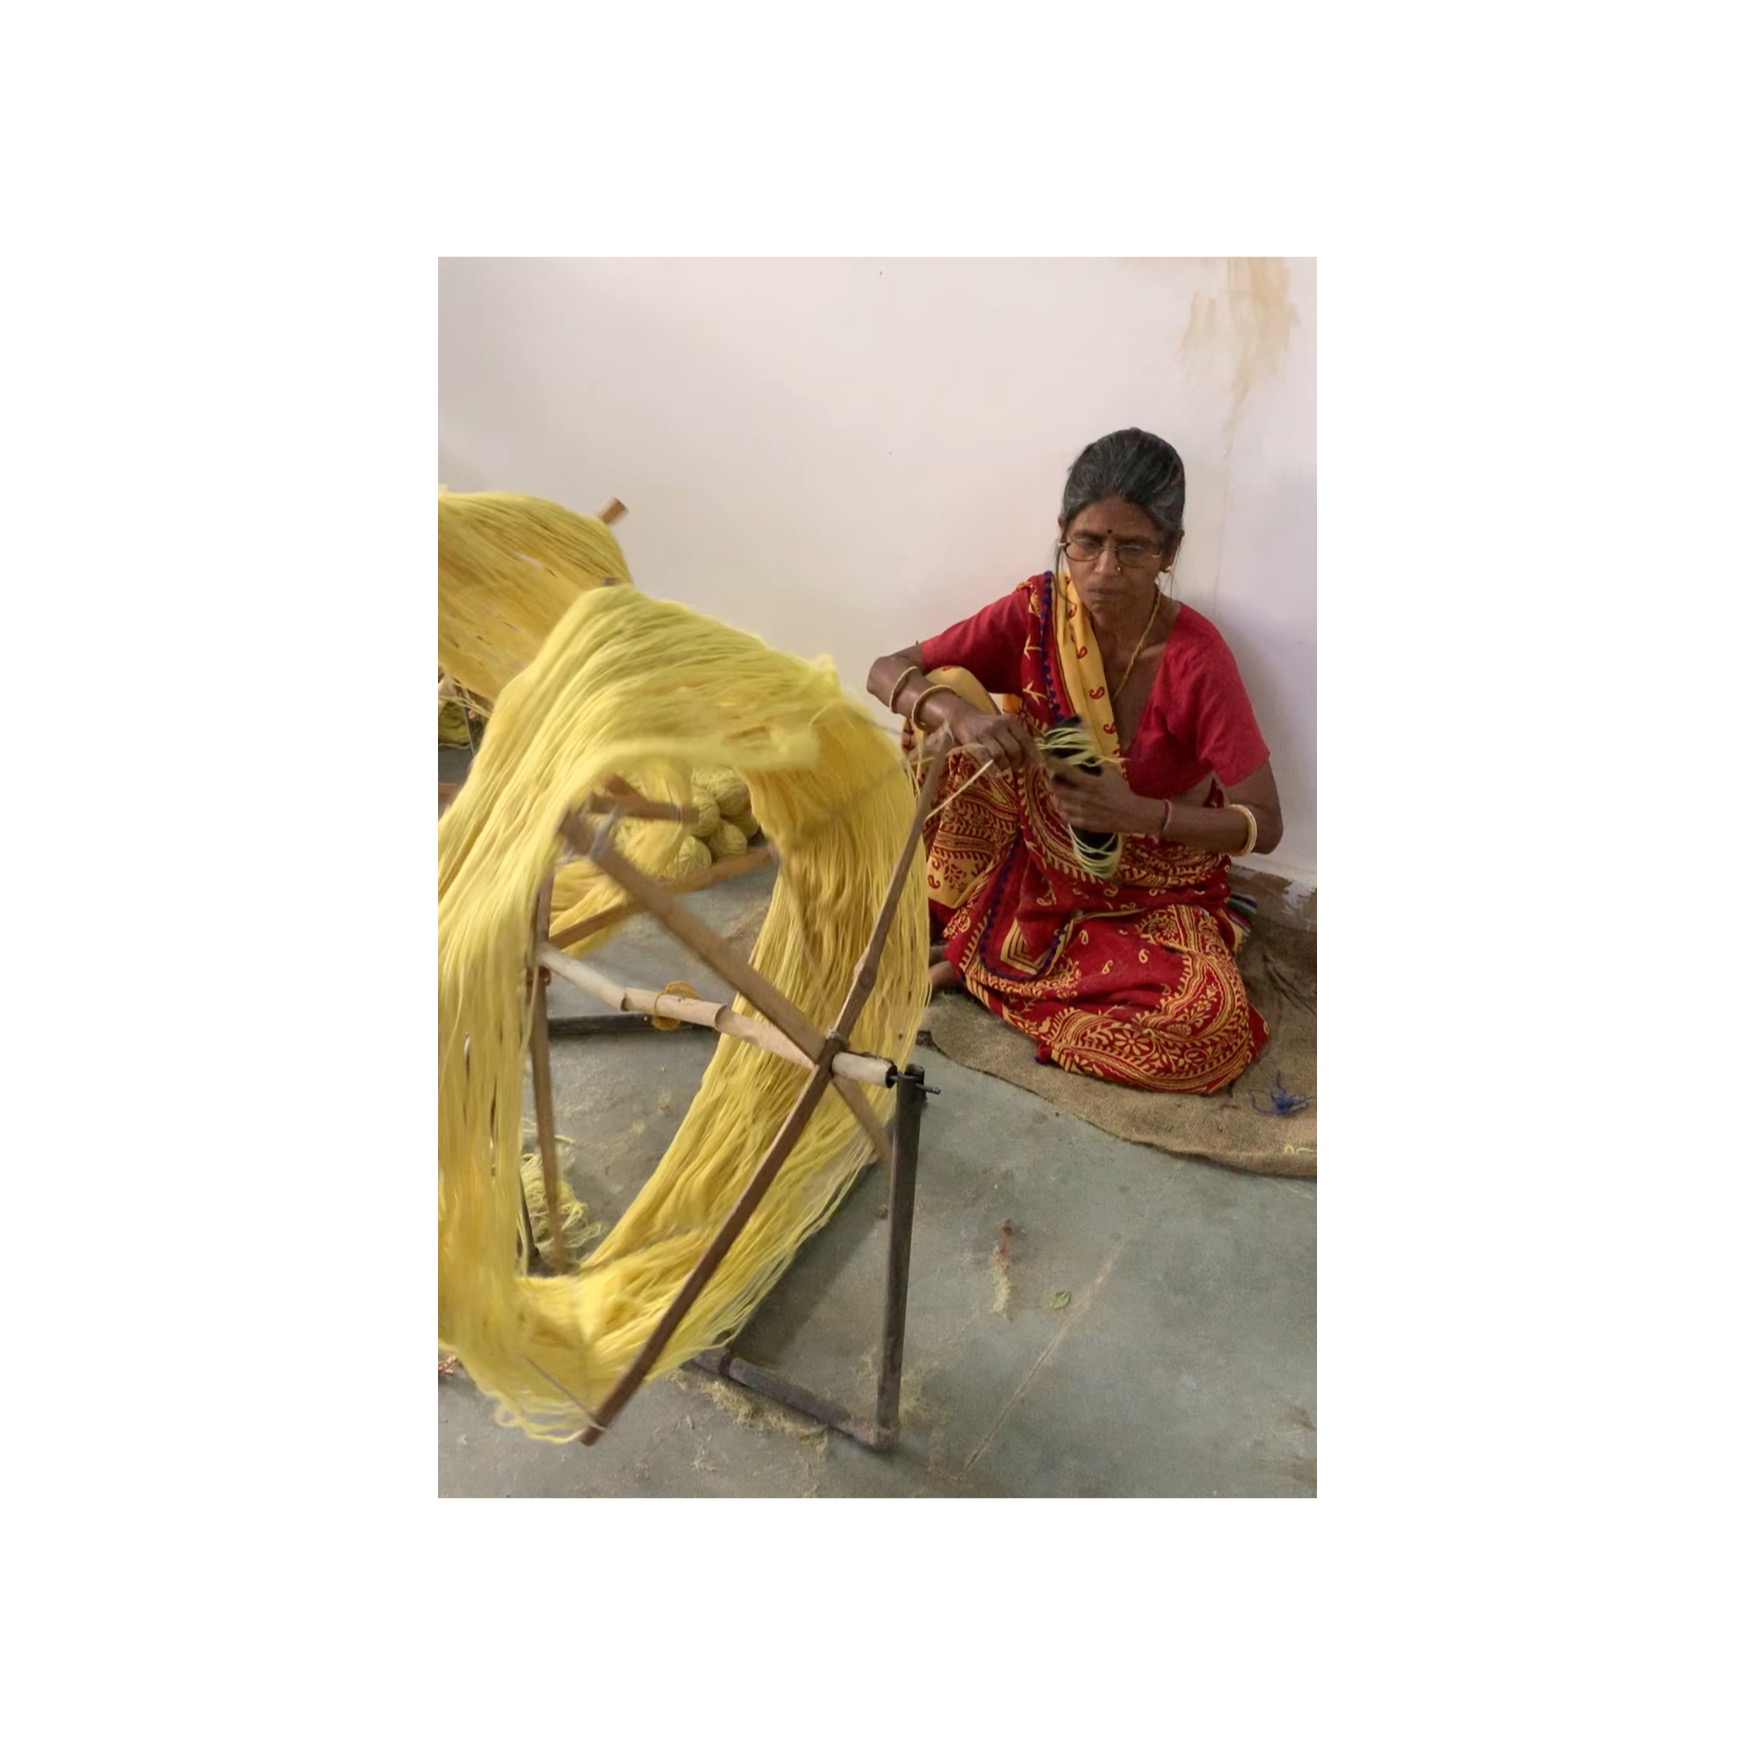 Traditional Indian Textile Weaving Loom - Sahana Byron Bay.JPG